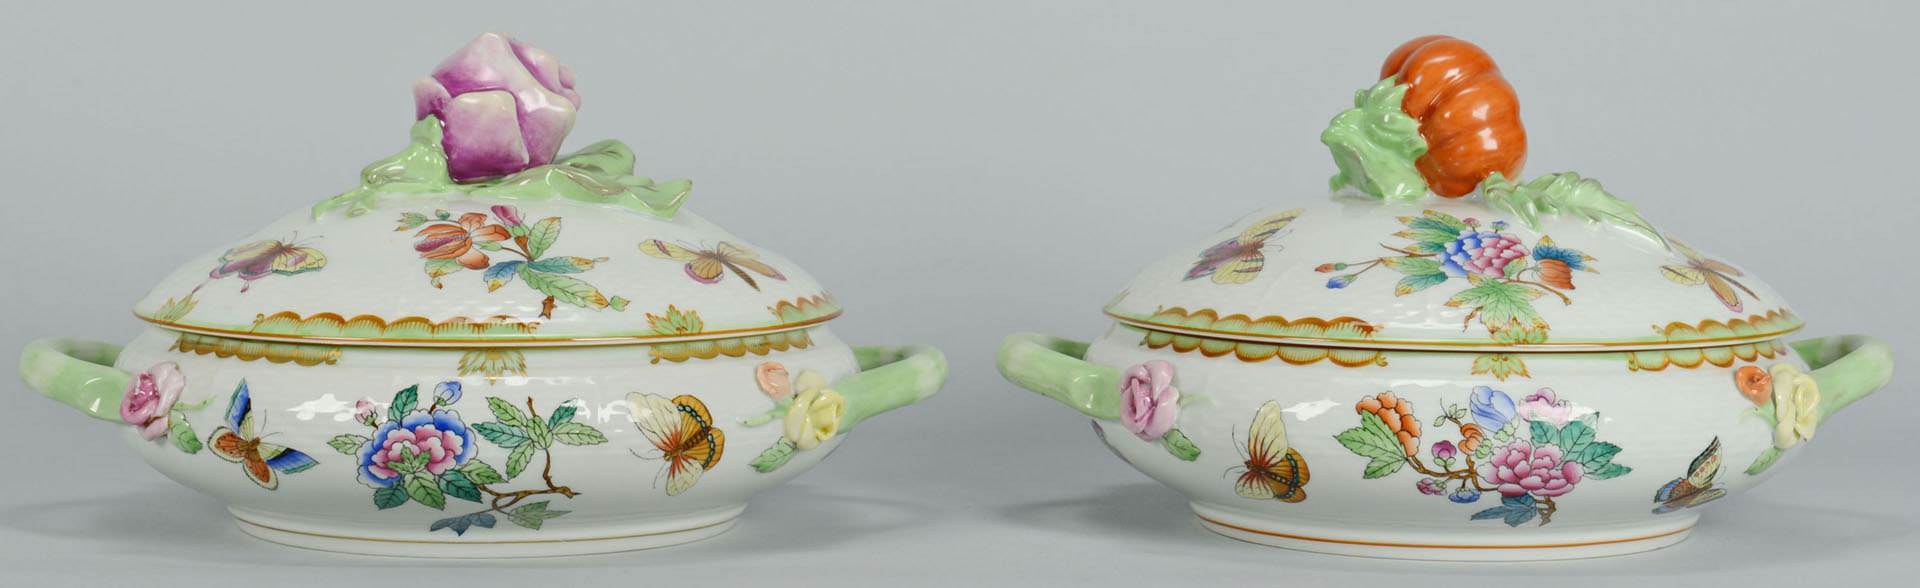 Lot 108: Herend Queen Victoria Porcelain Serving Pieces